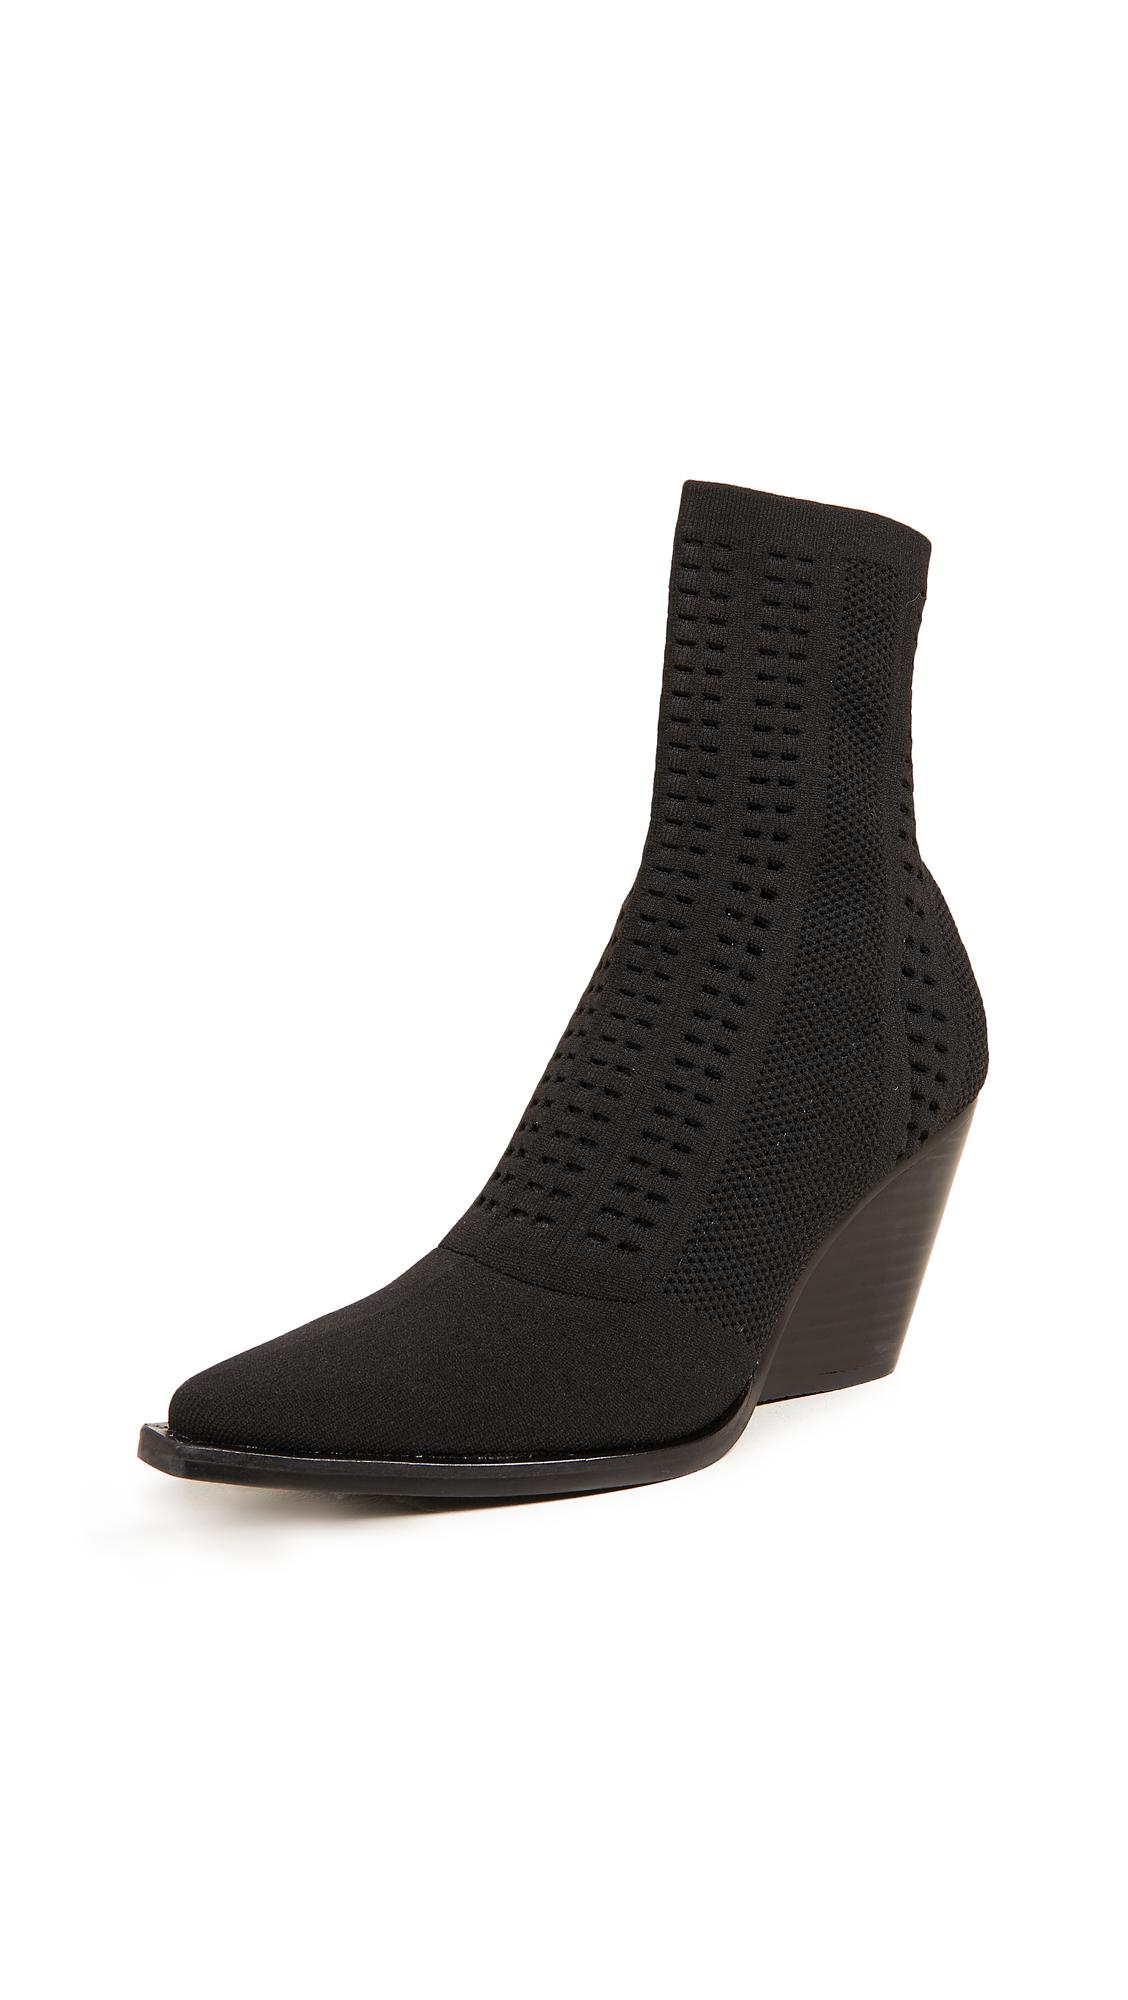 Jeffrey Campbell Walton Point Toe Boots - Black